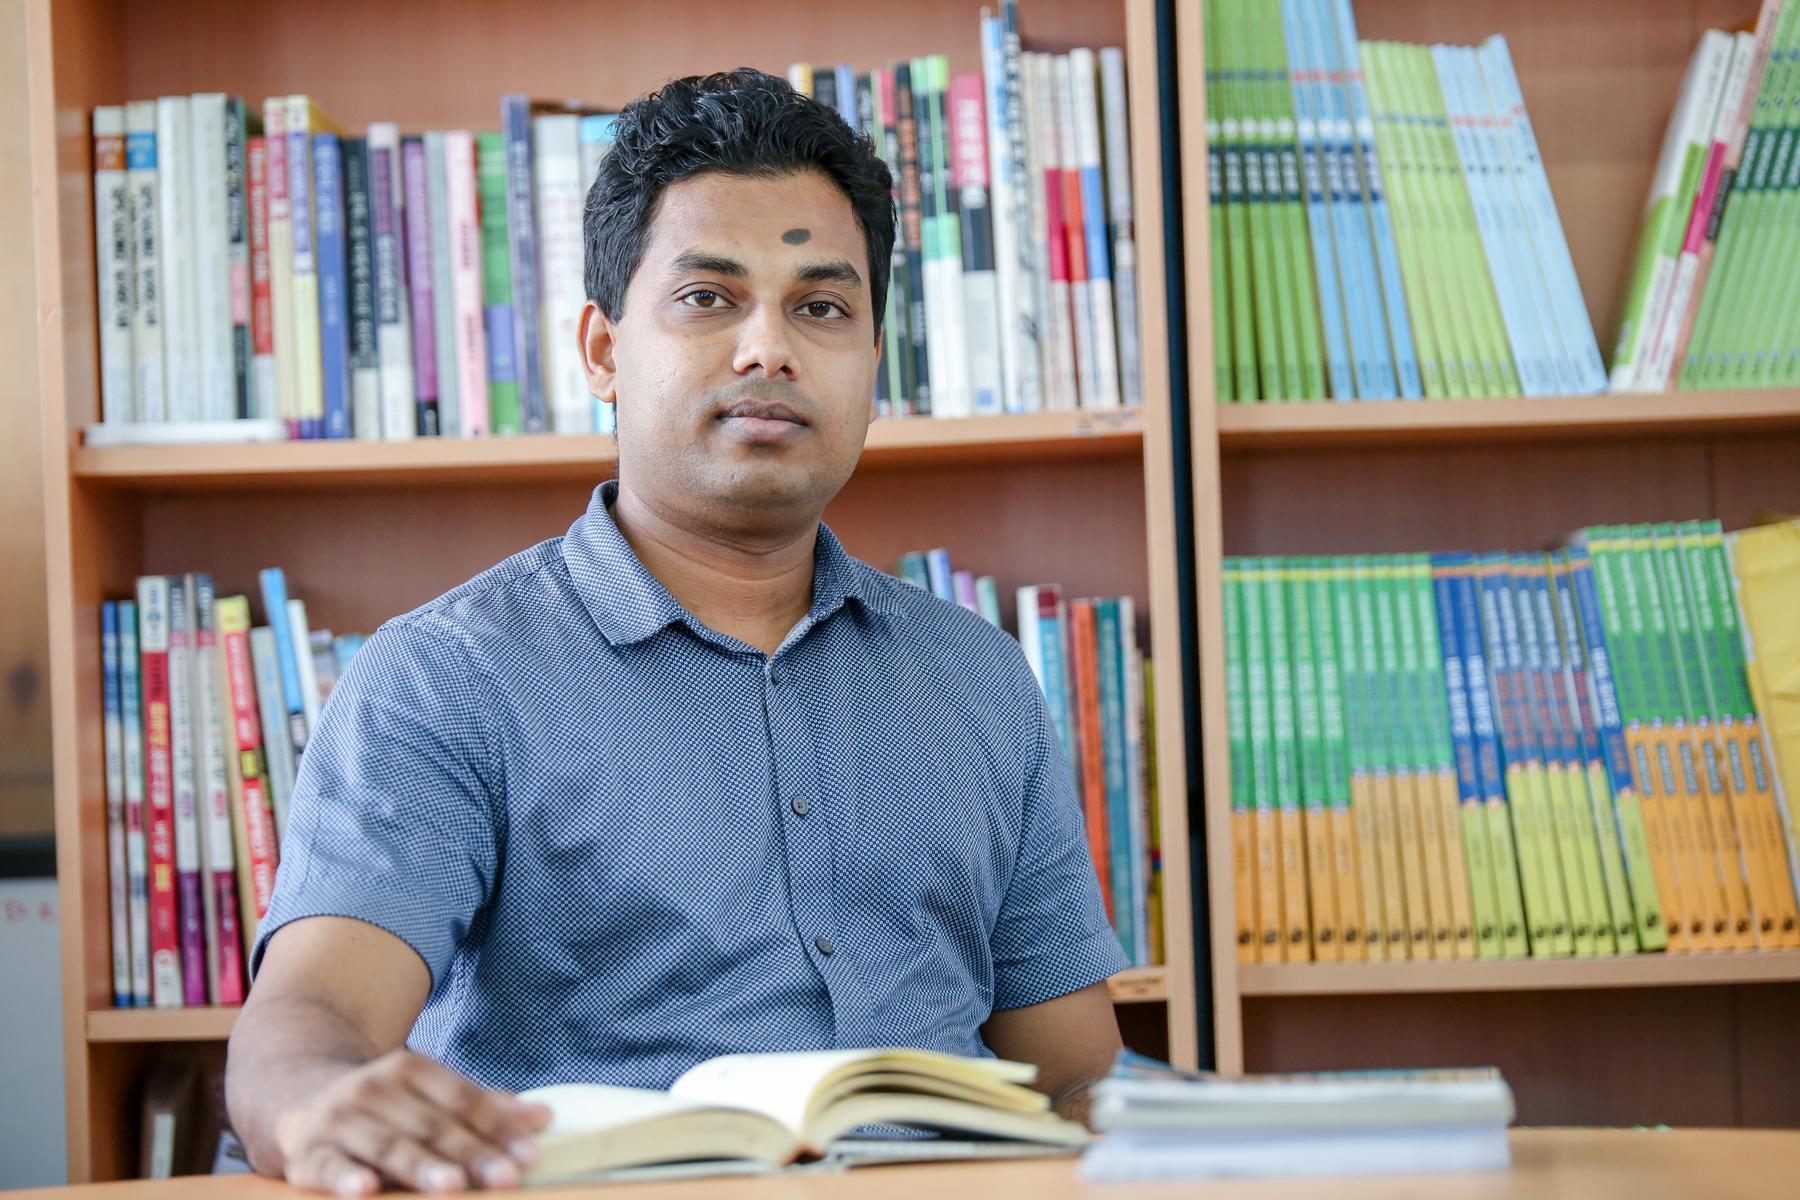 Mr. Mallikage Amilajith Nisanka Leelarathne.